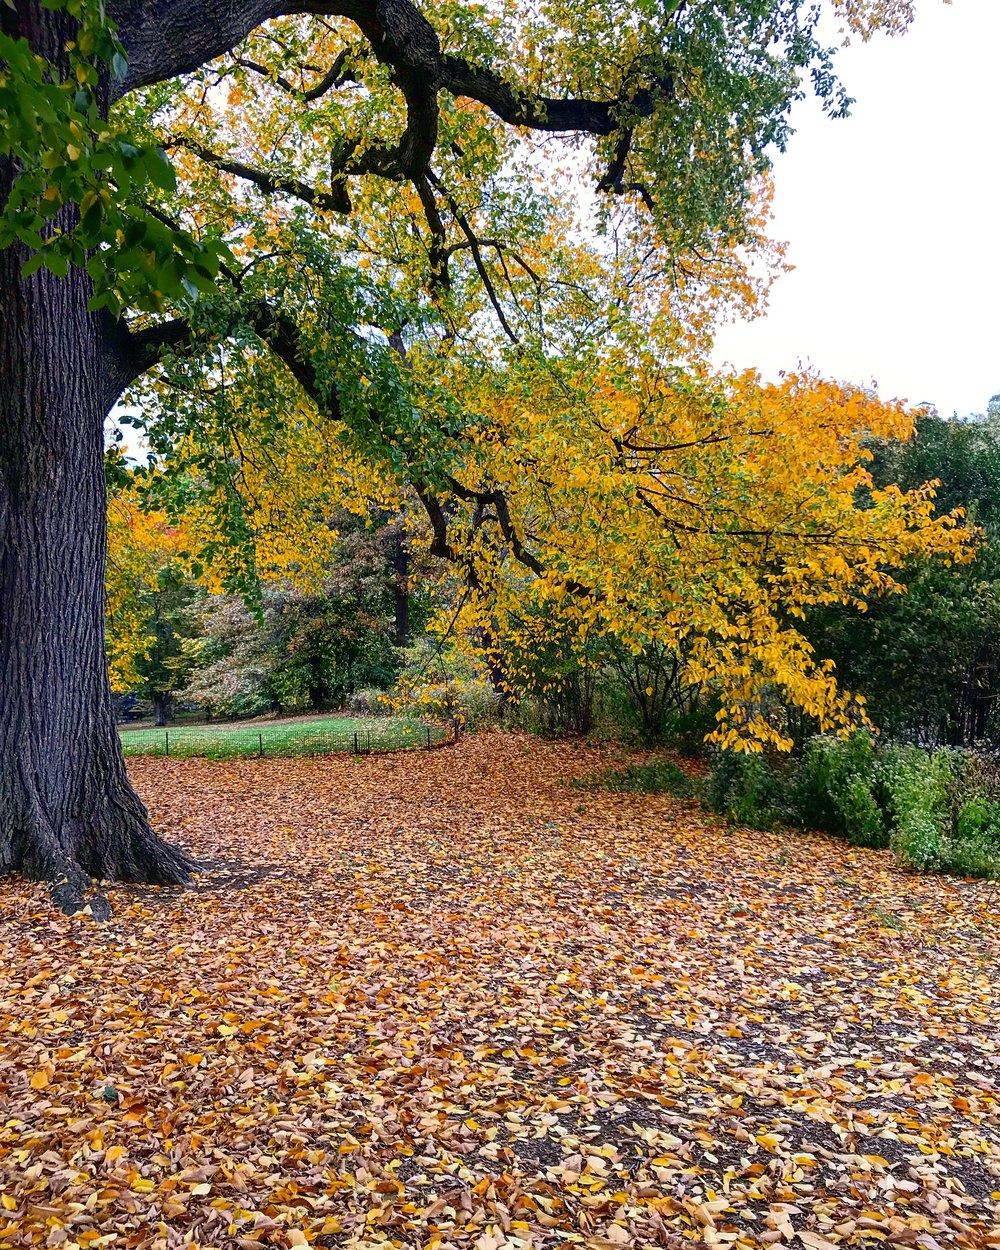 Central Park, 97th Street Transverse & 5th Avenue - October 26th, 2017.